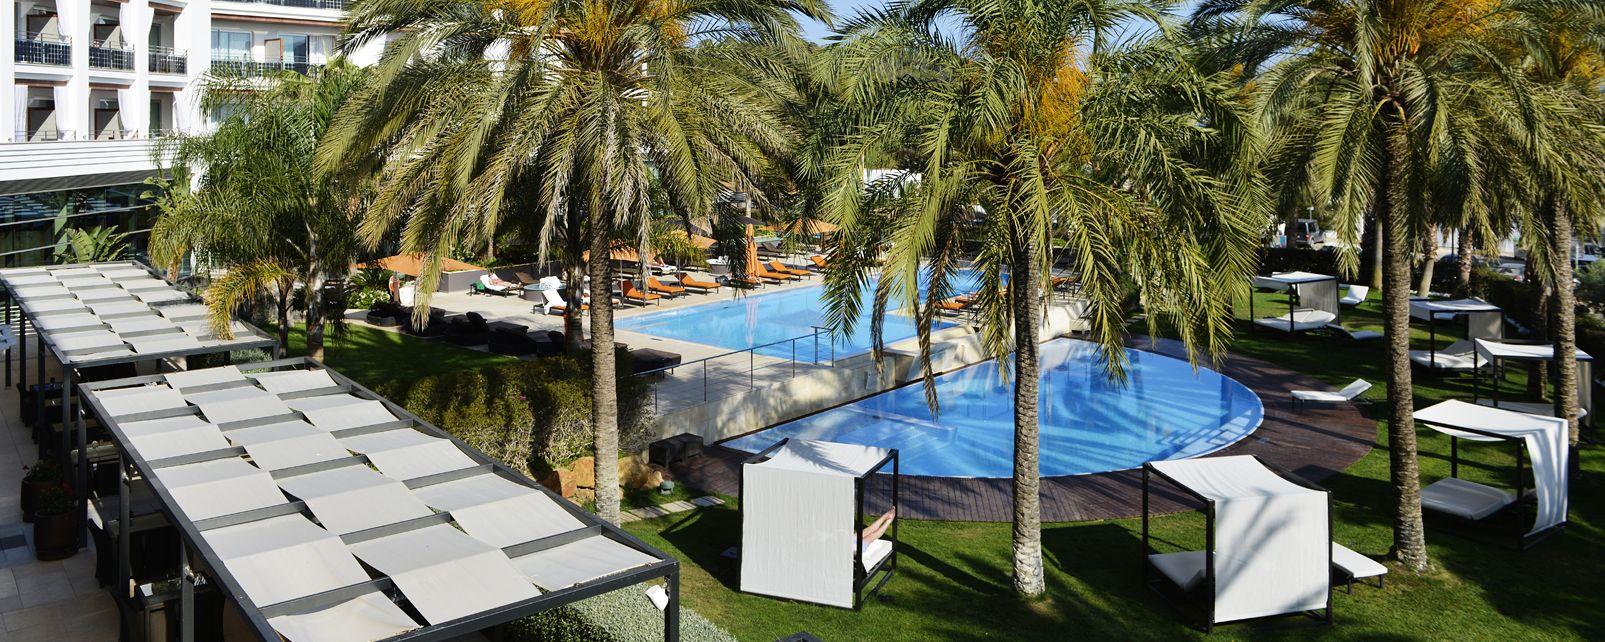 Hotel Aguas de Ibiza Lifestyle and Spa